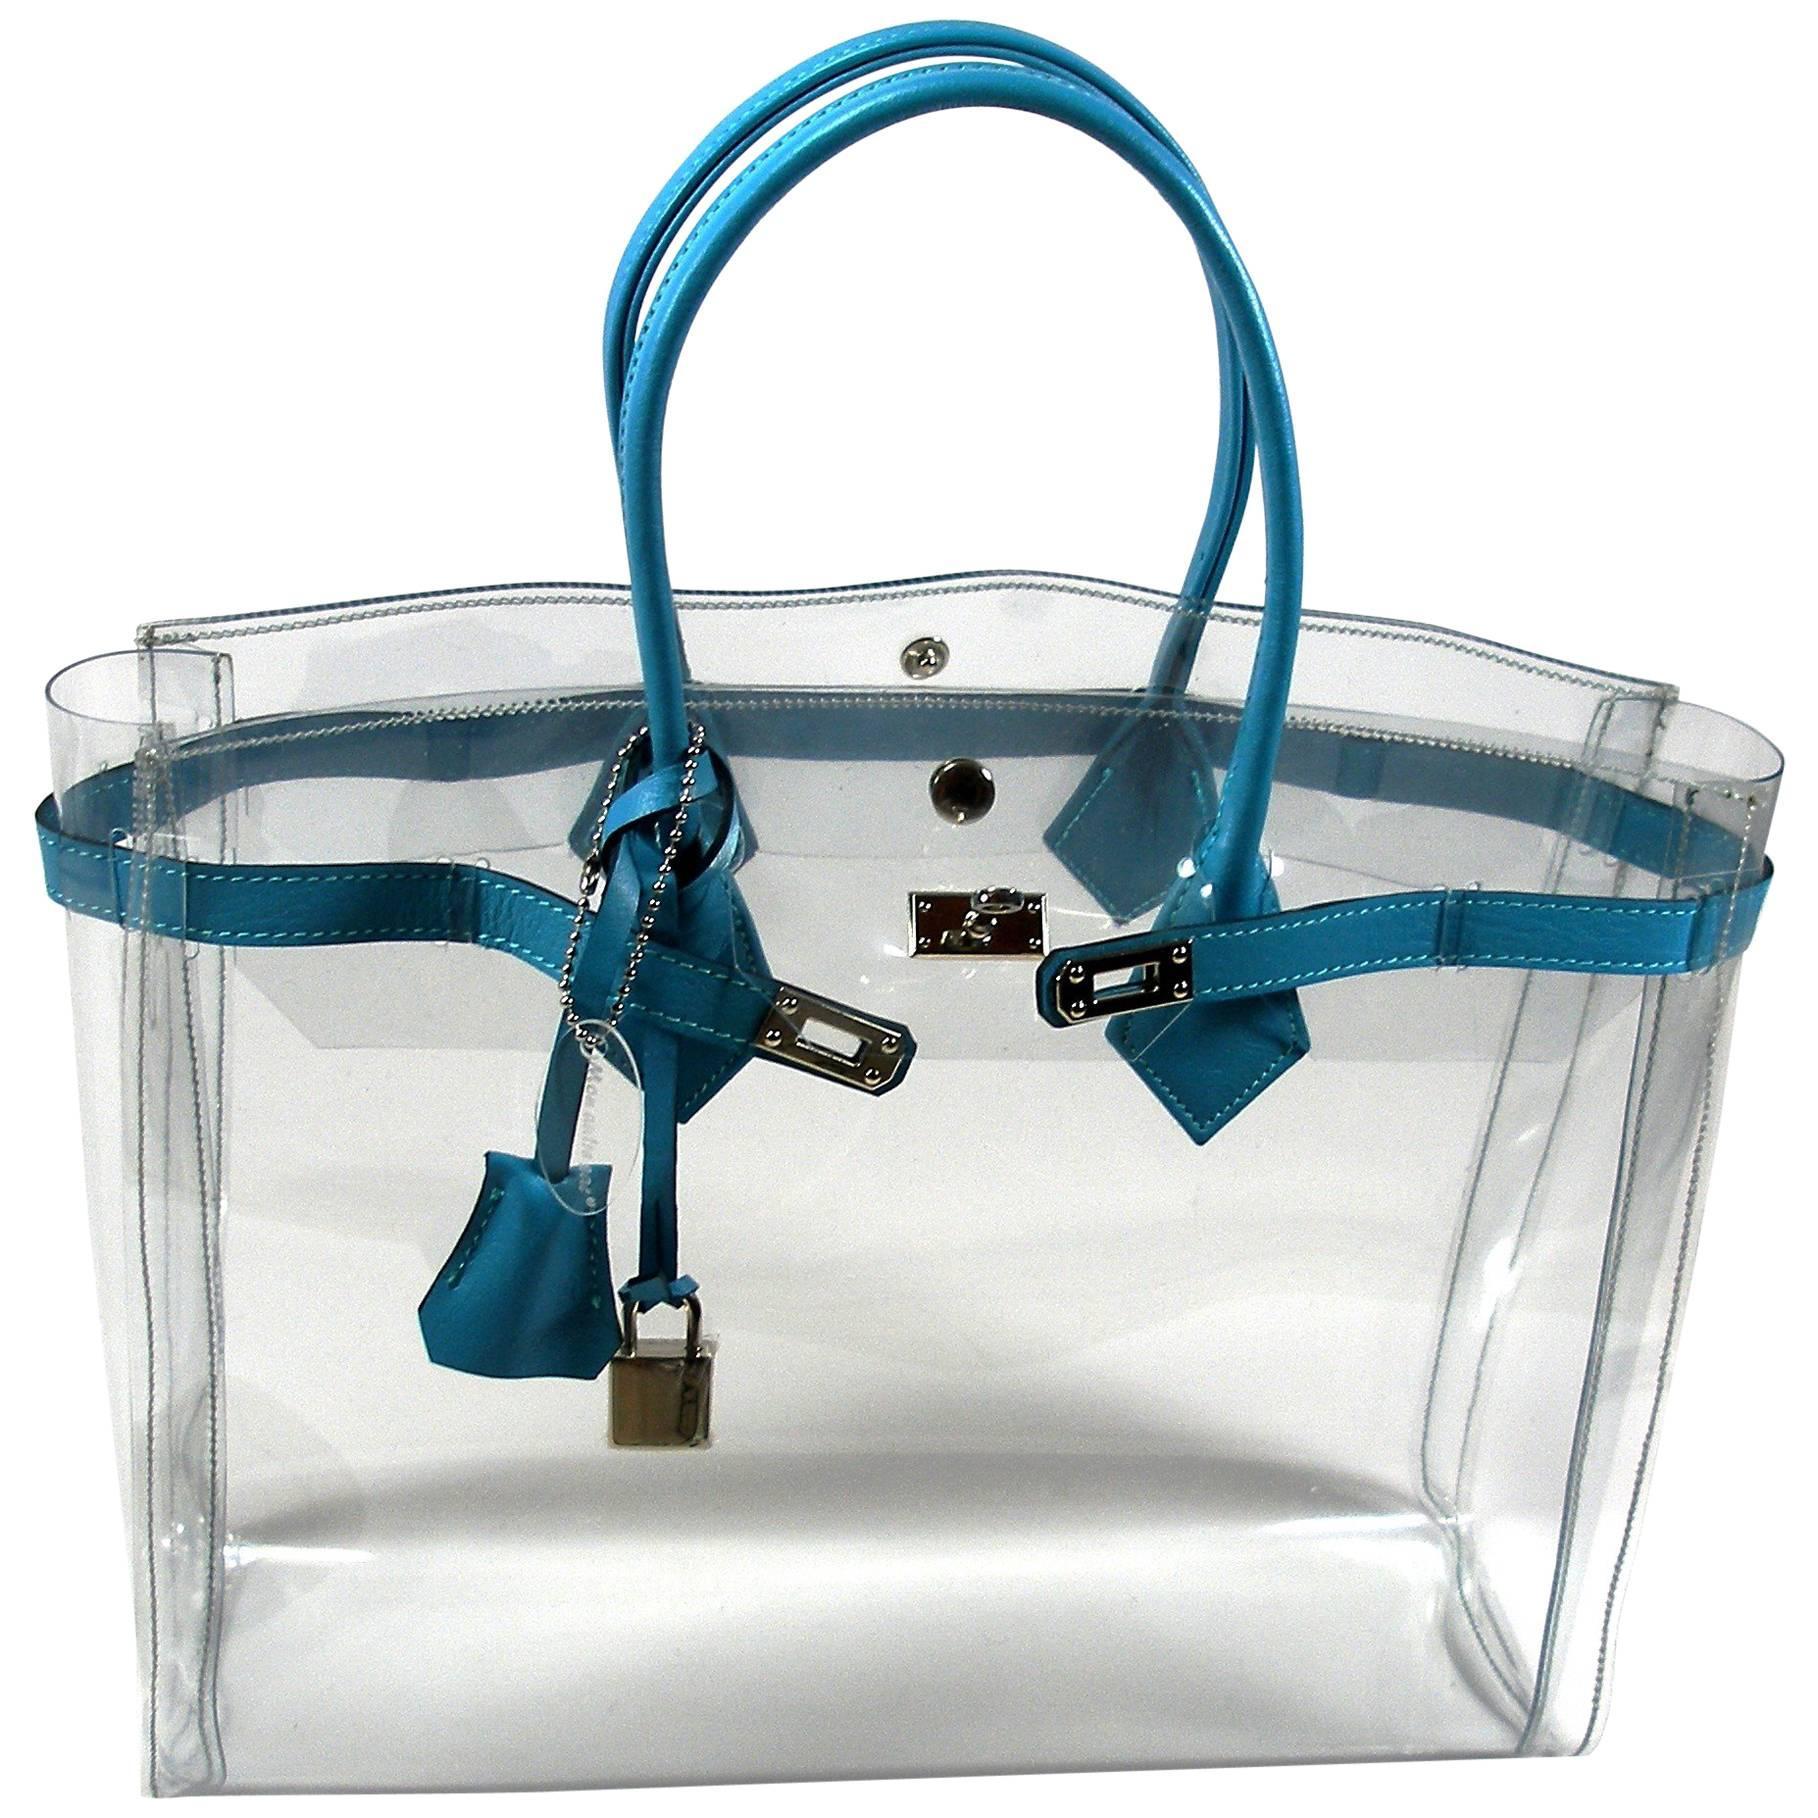 1stdibs Original Mon Autre Sac Cabas Diamant Pvc And Bleu Ciel Leather / Brand New IE5gAPRsk